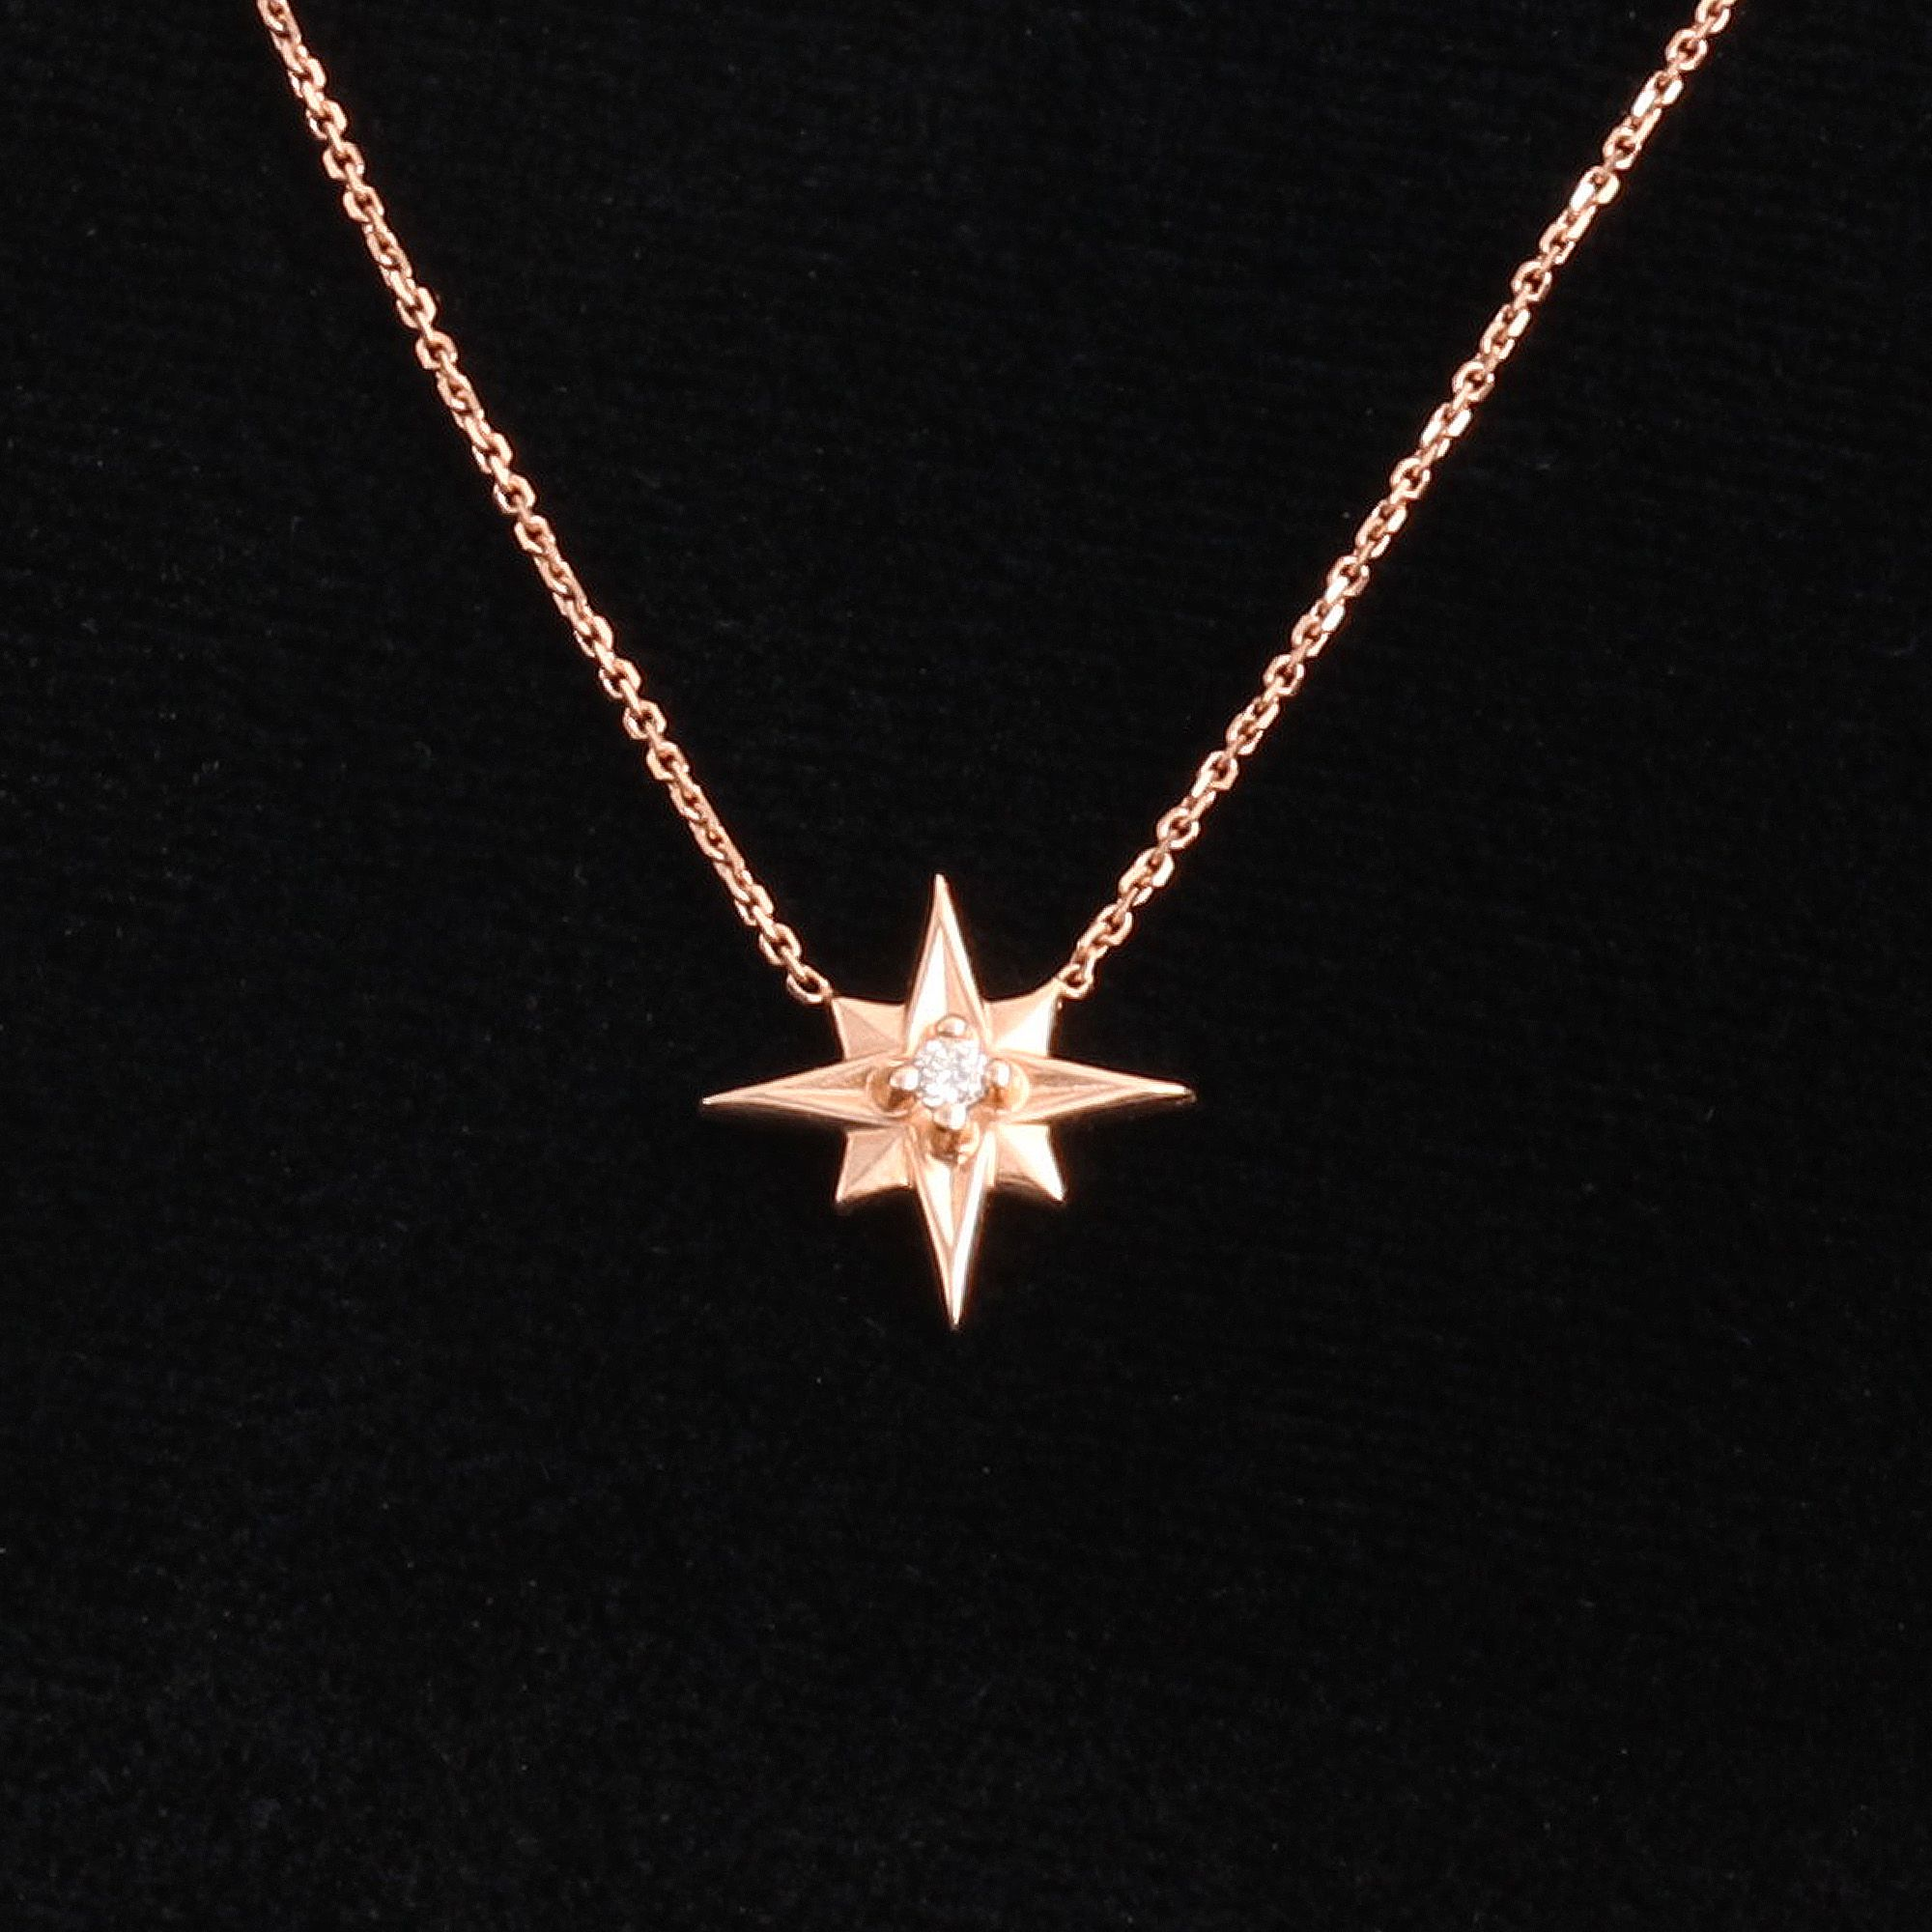 Compass Rose Necklace (14k Rose Gold)